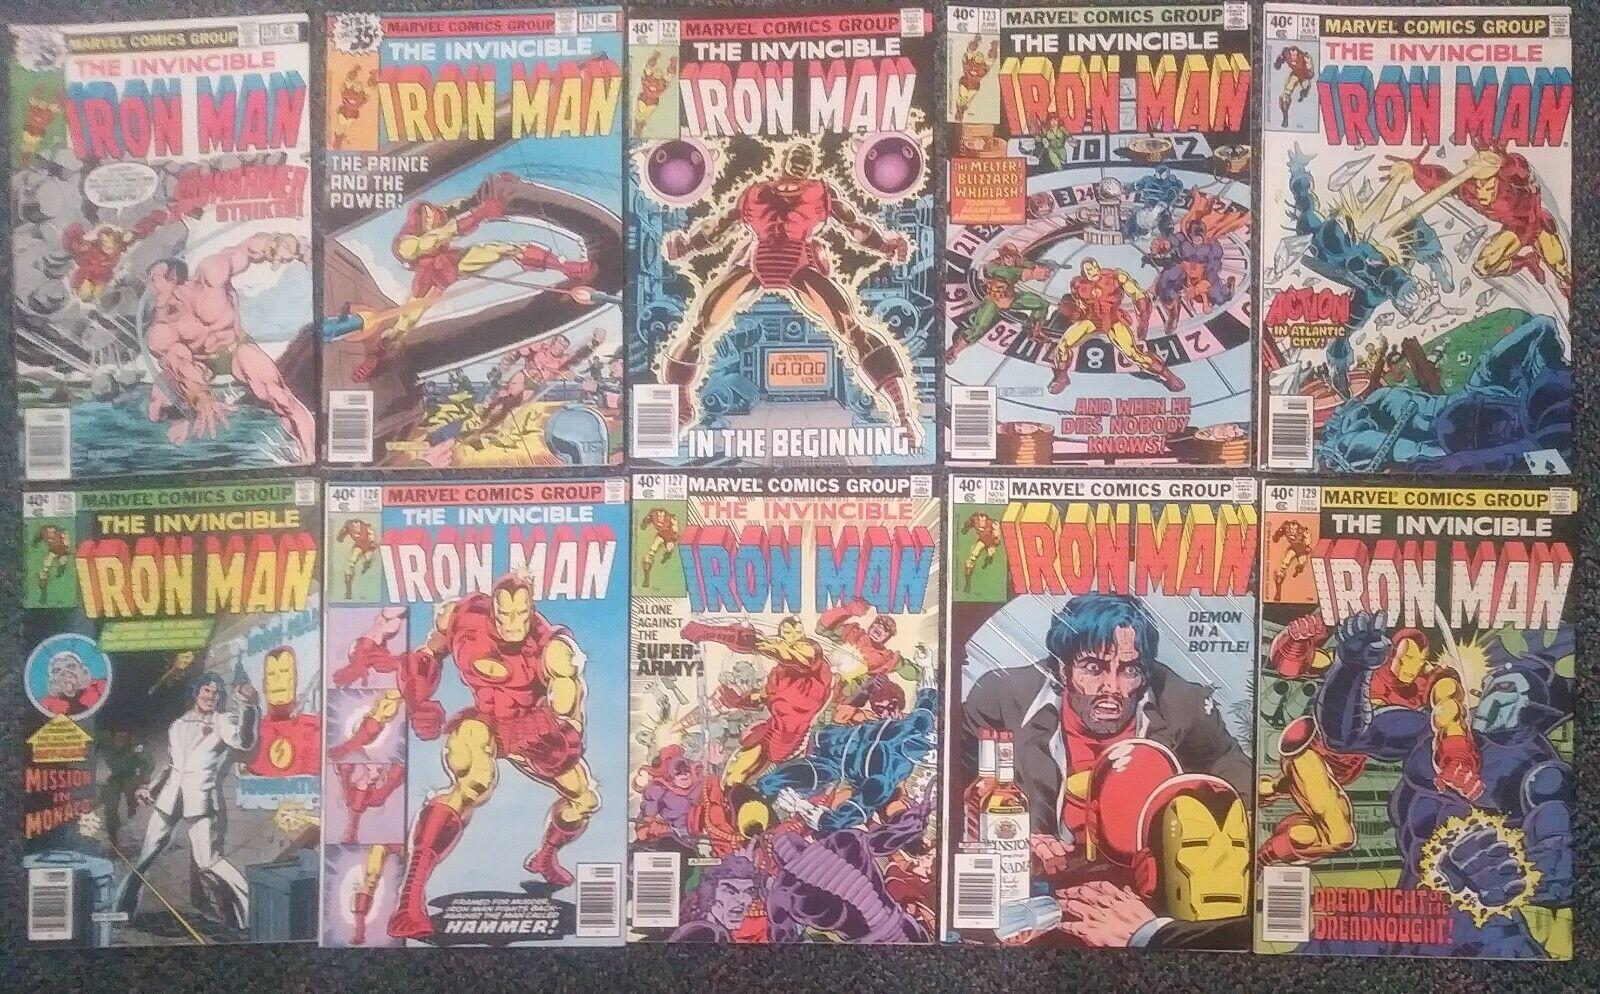 Iron Man Lot - 120, 121, 122, 123, 124, 125, 126, 127, 128, 129